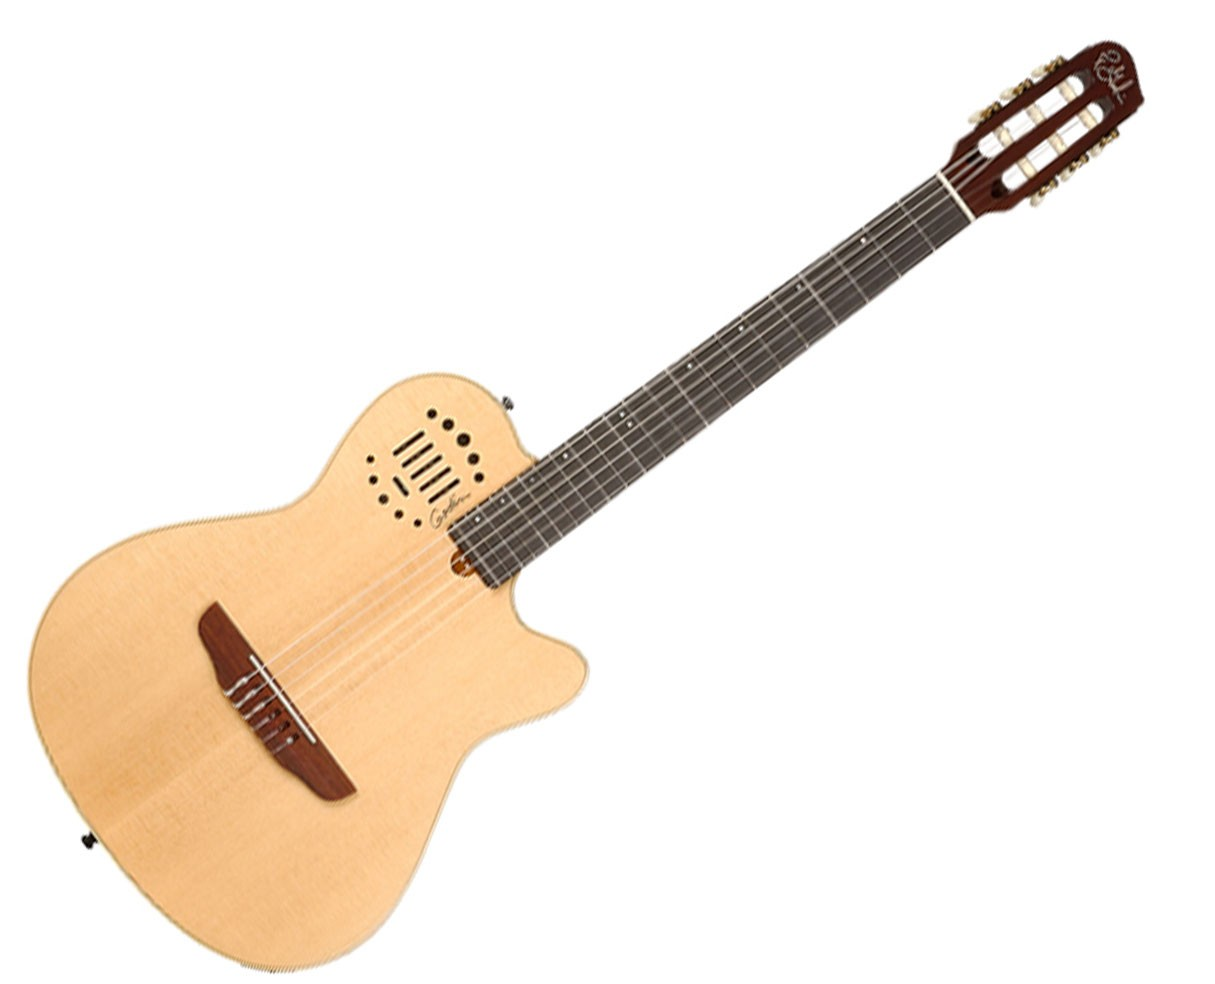 Godin Guitars MultiAc Nylon Duet Ambiance